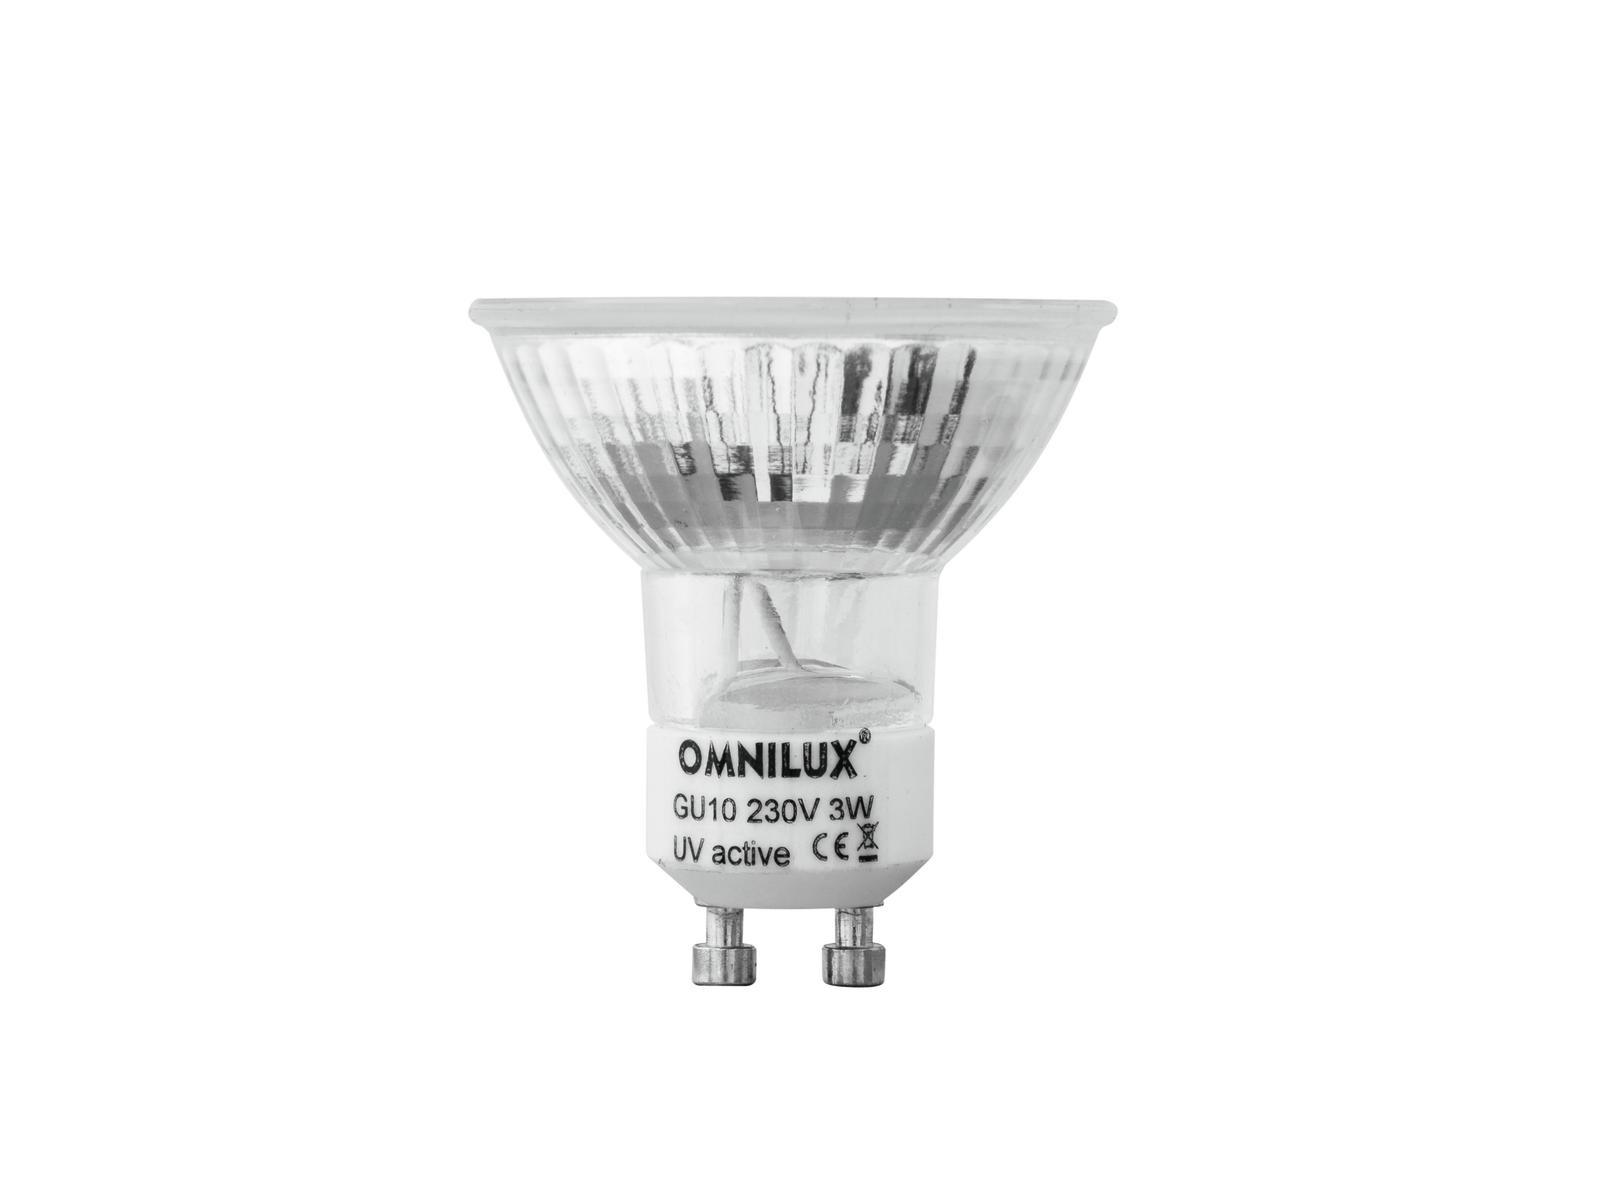 OMNILUX GU-10 230V 60 LED UV active